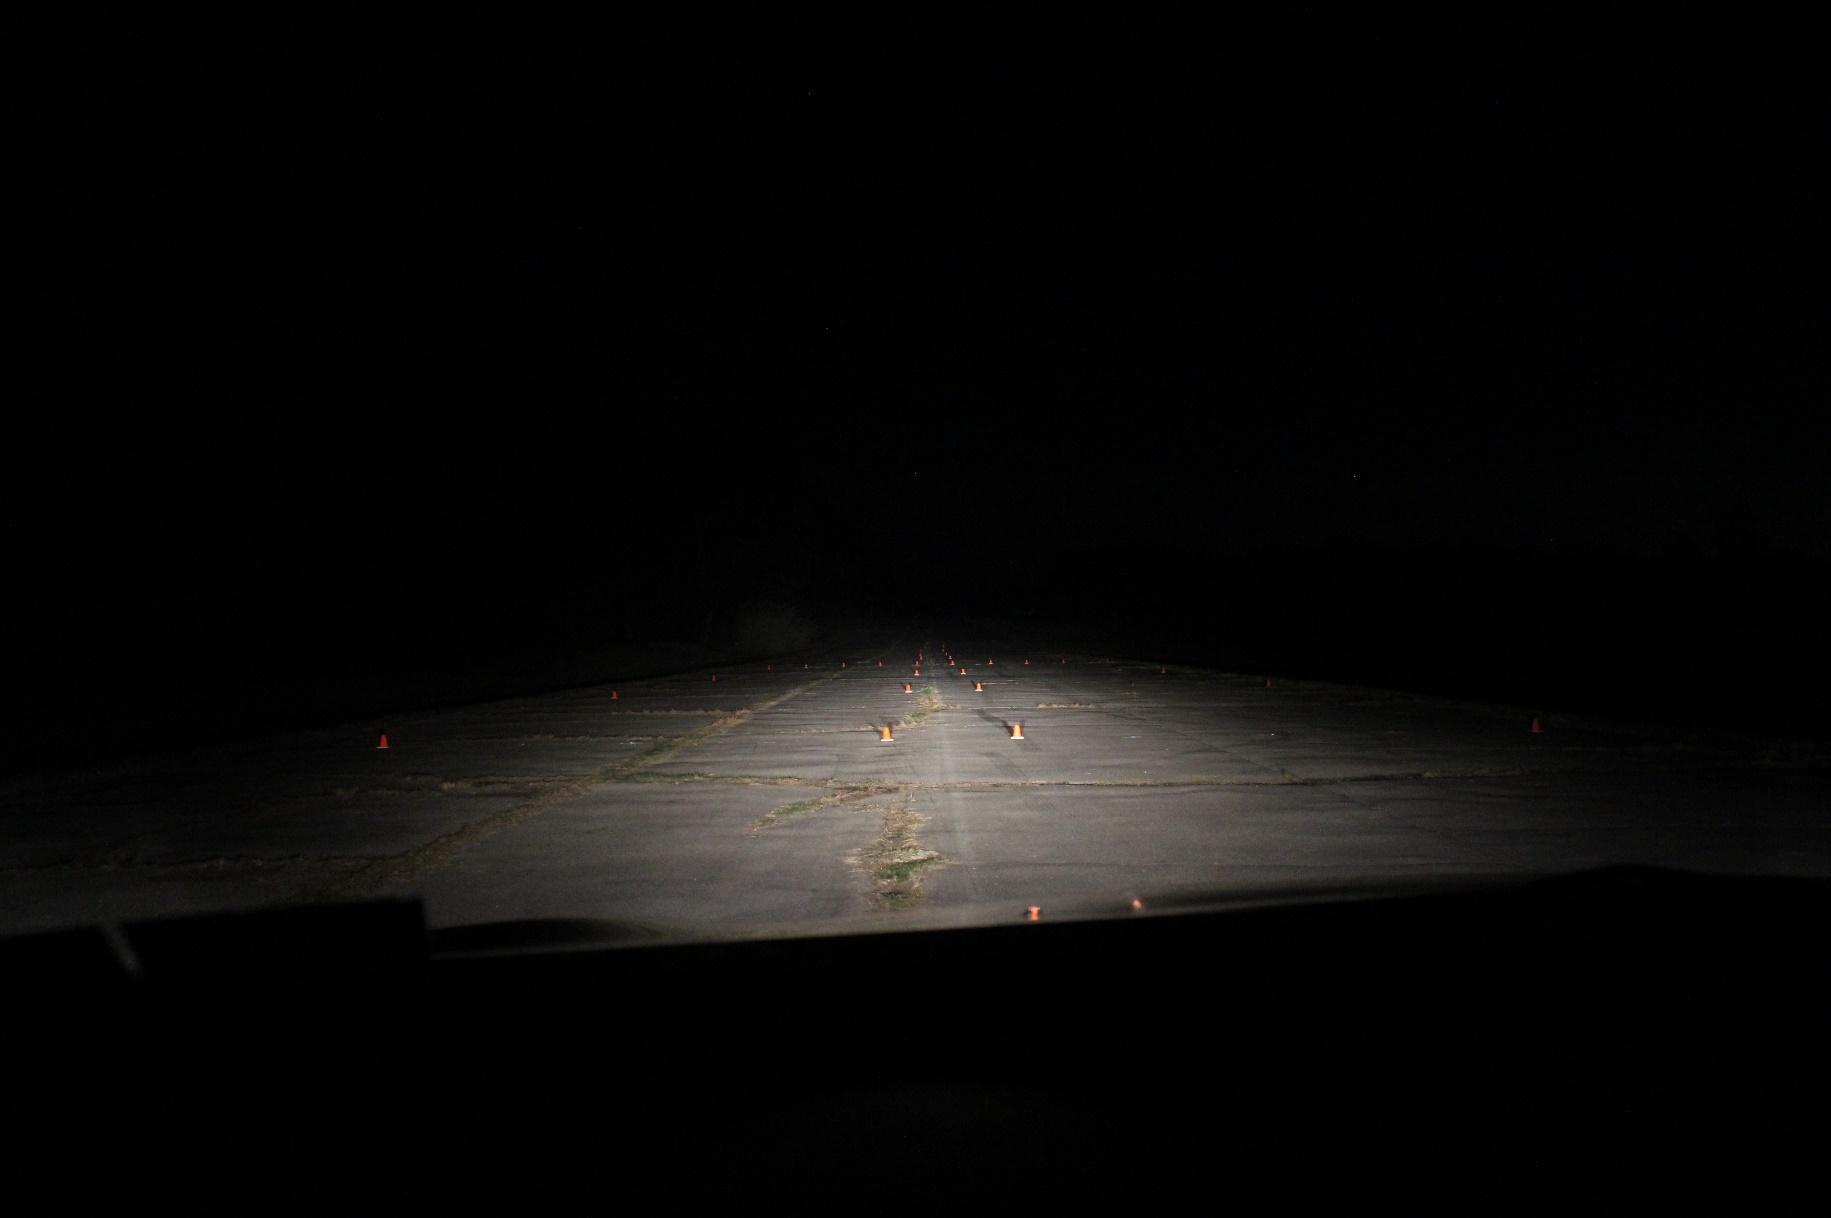 headlights illuminating the road at night